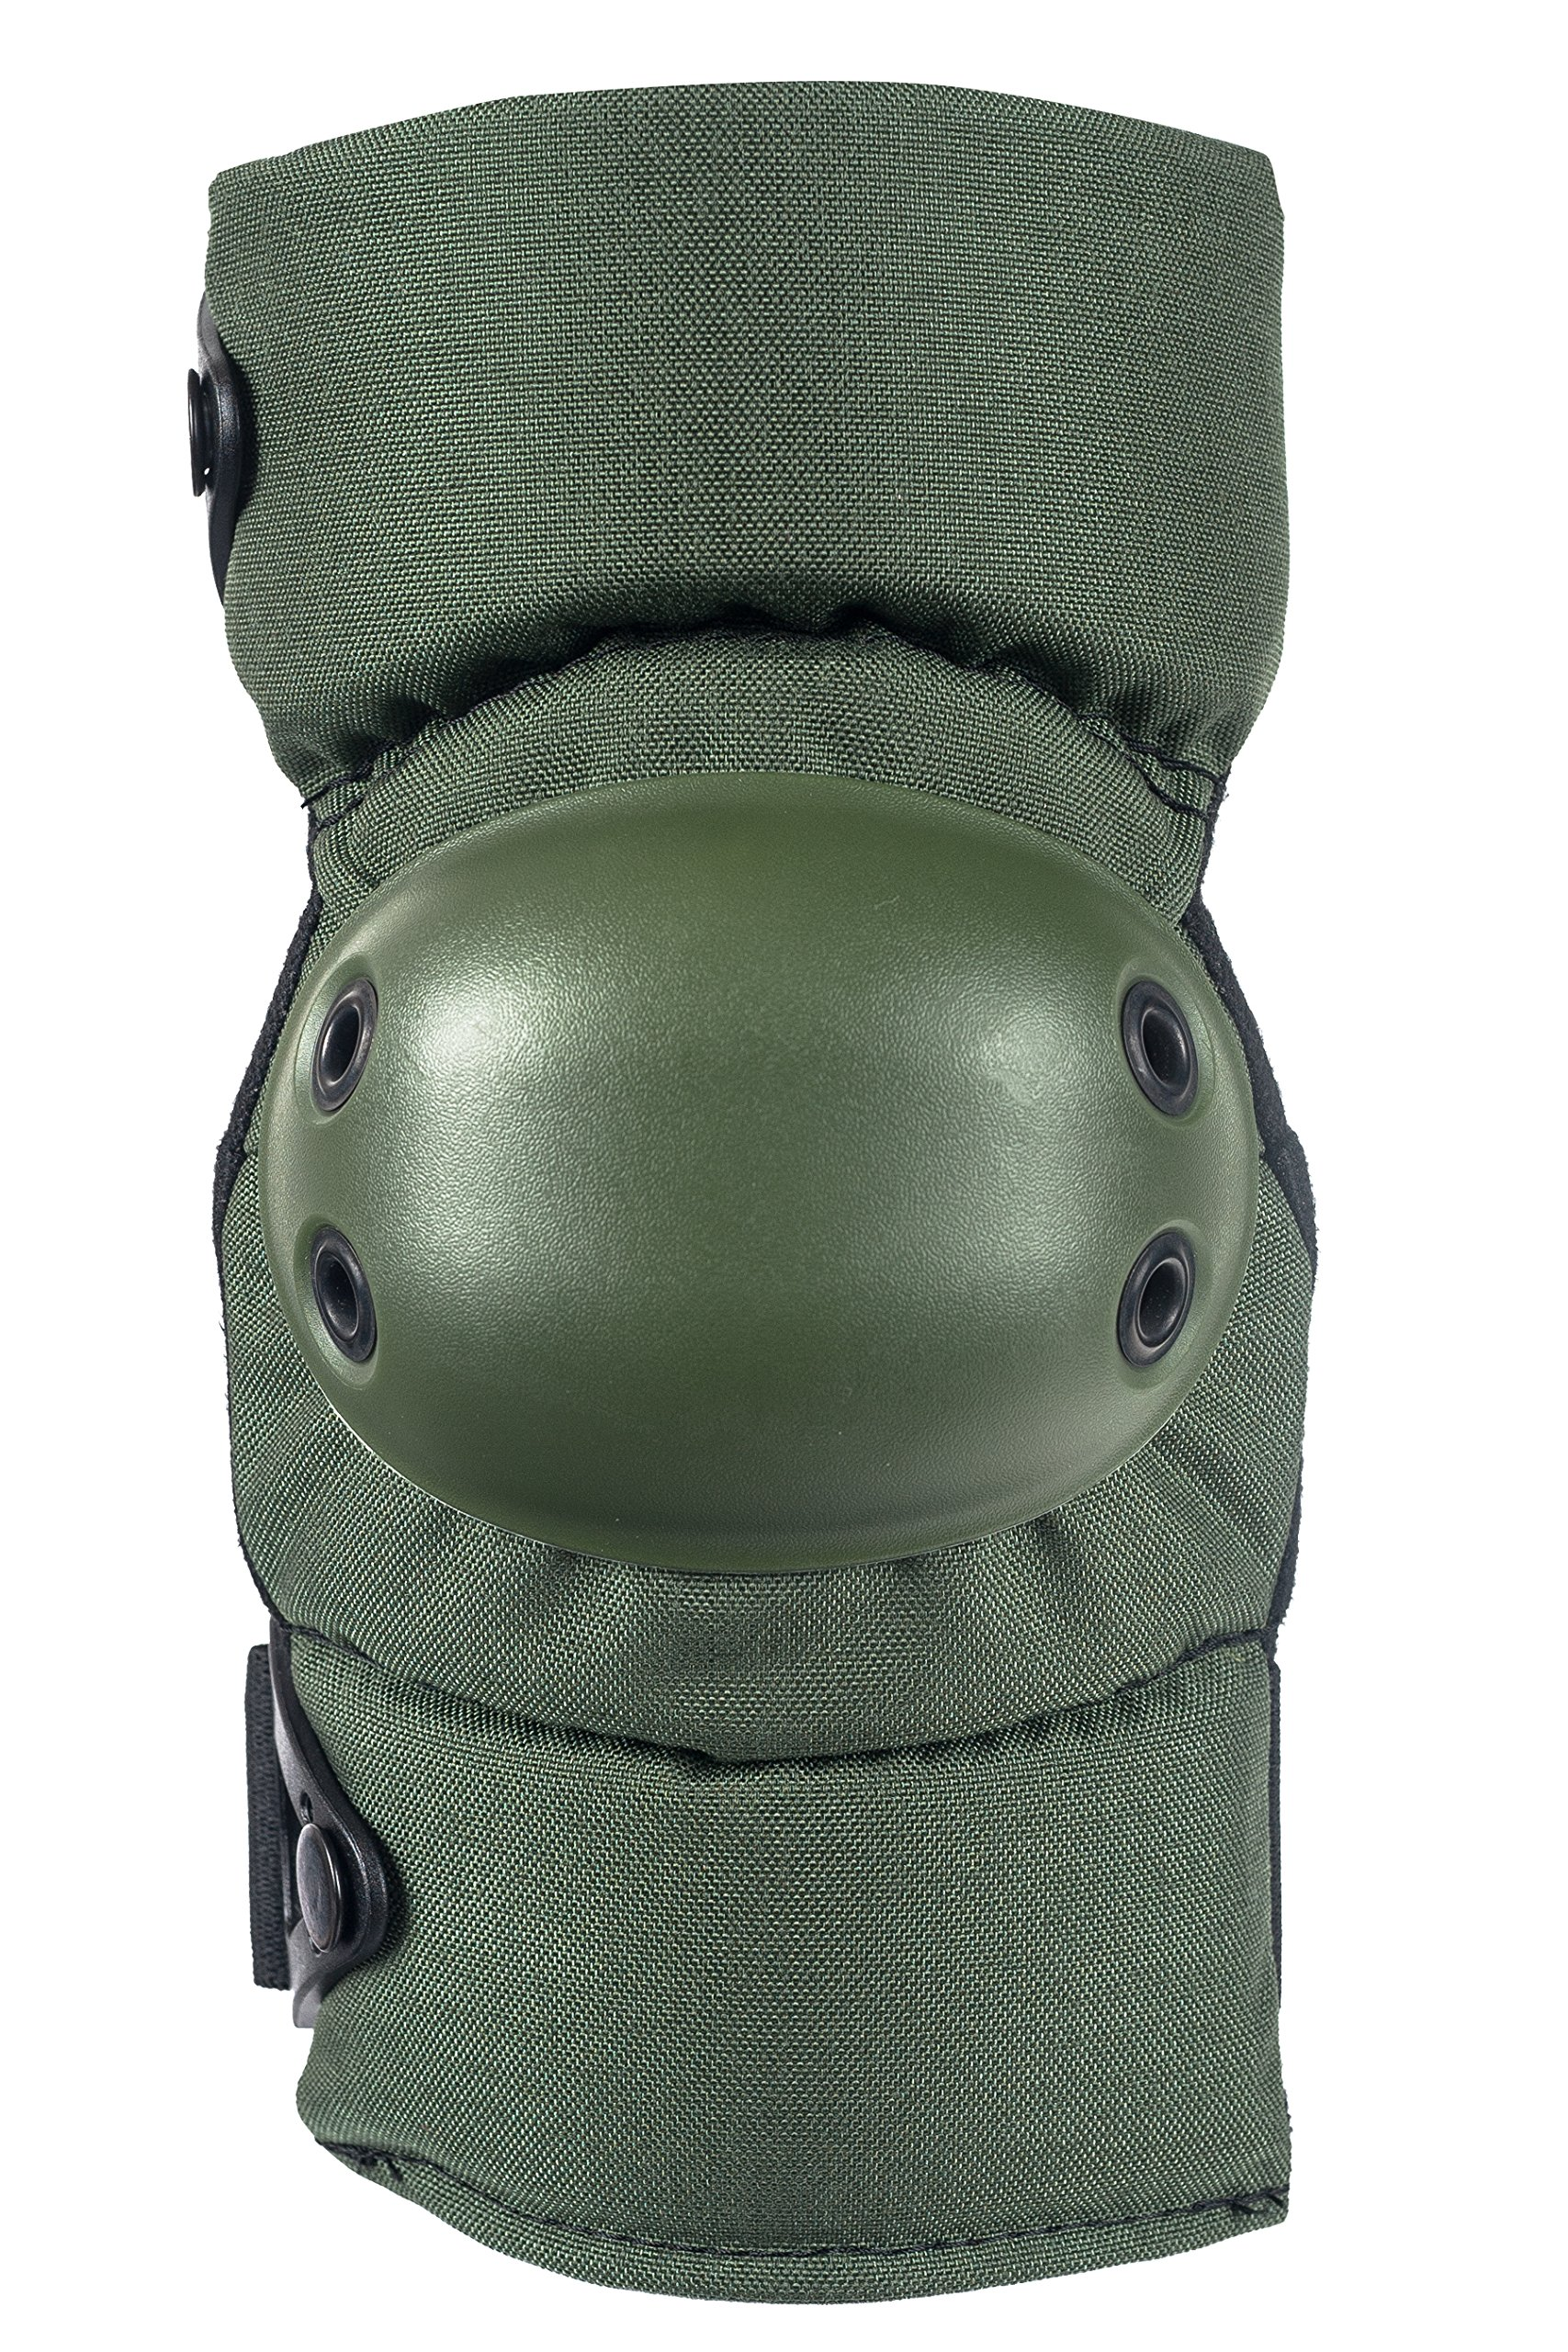 ALTA 53113.09 AltaCONTOUR Elbow Protector Pad, Olive Green Cordura Nylon Fabric, AltaLOK Fastening, Flexible Cap, Round, Olive Green